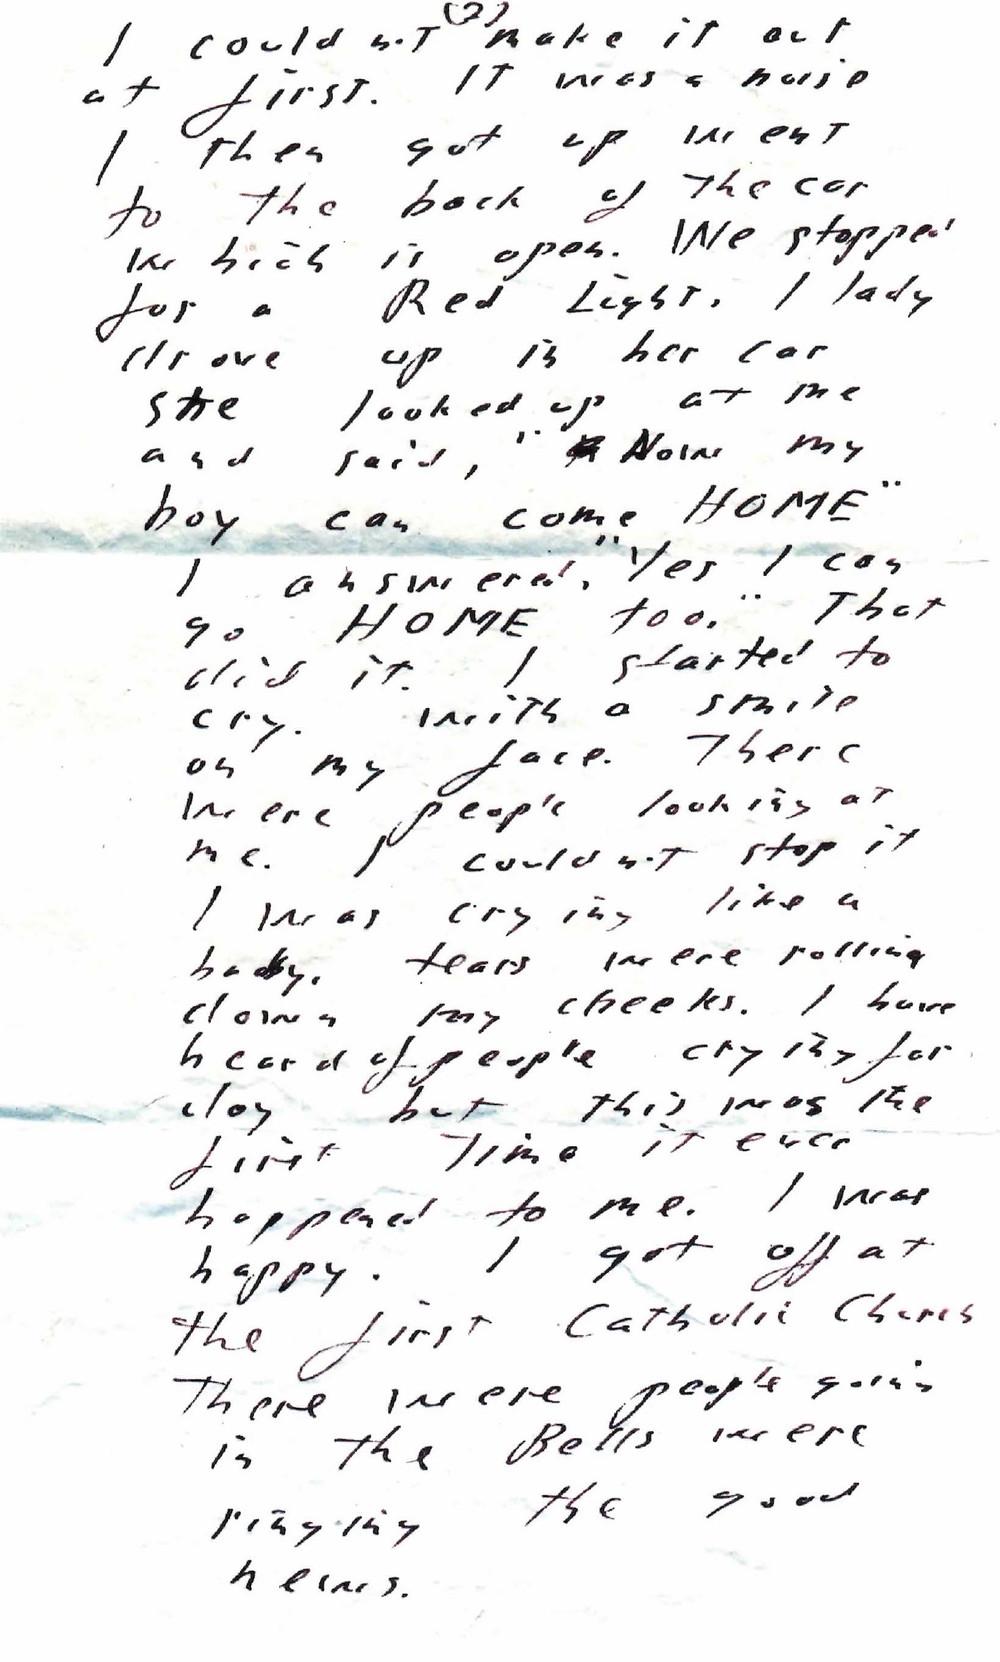 Daddy's letter VJ Day San Fransisco 003.jpg